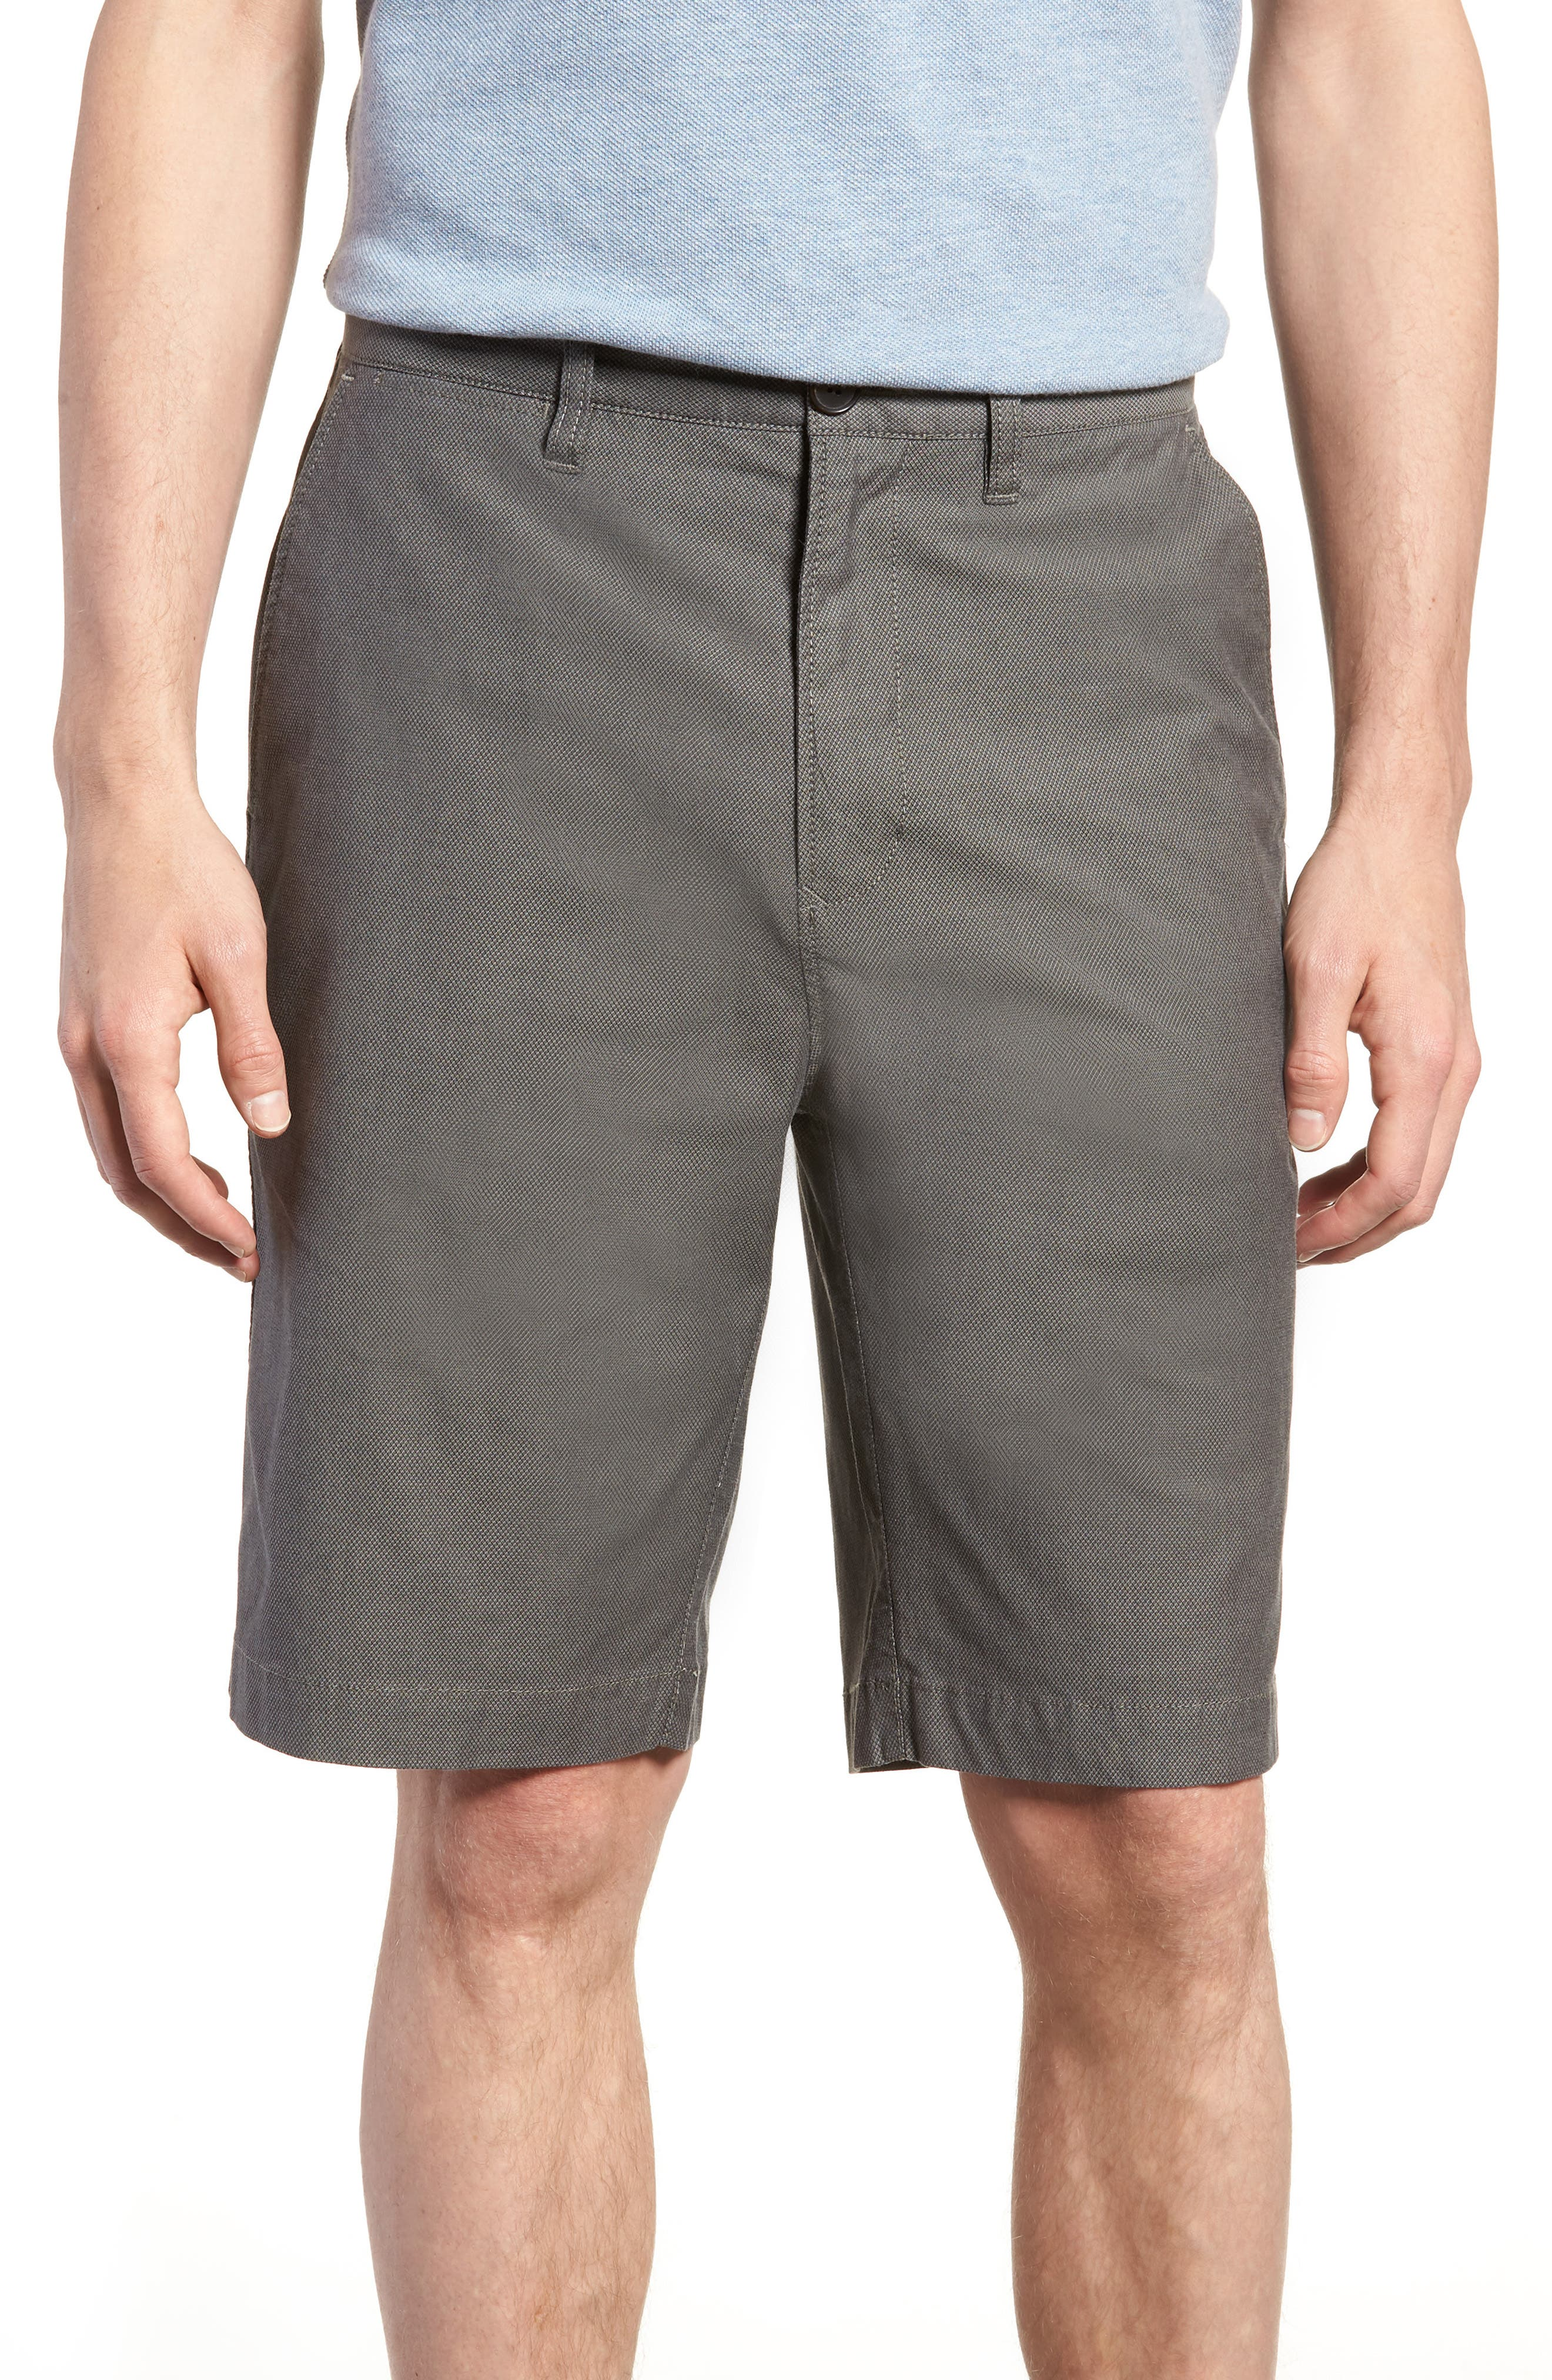 Army Bay Regular Fit Shorts,                         Main,                         color, Granite